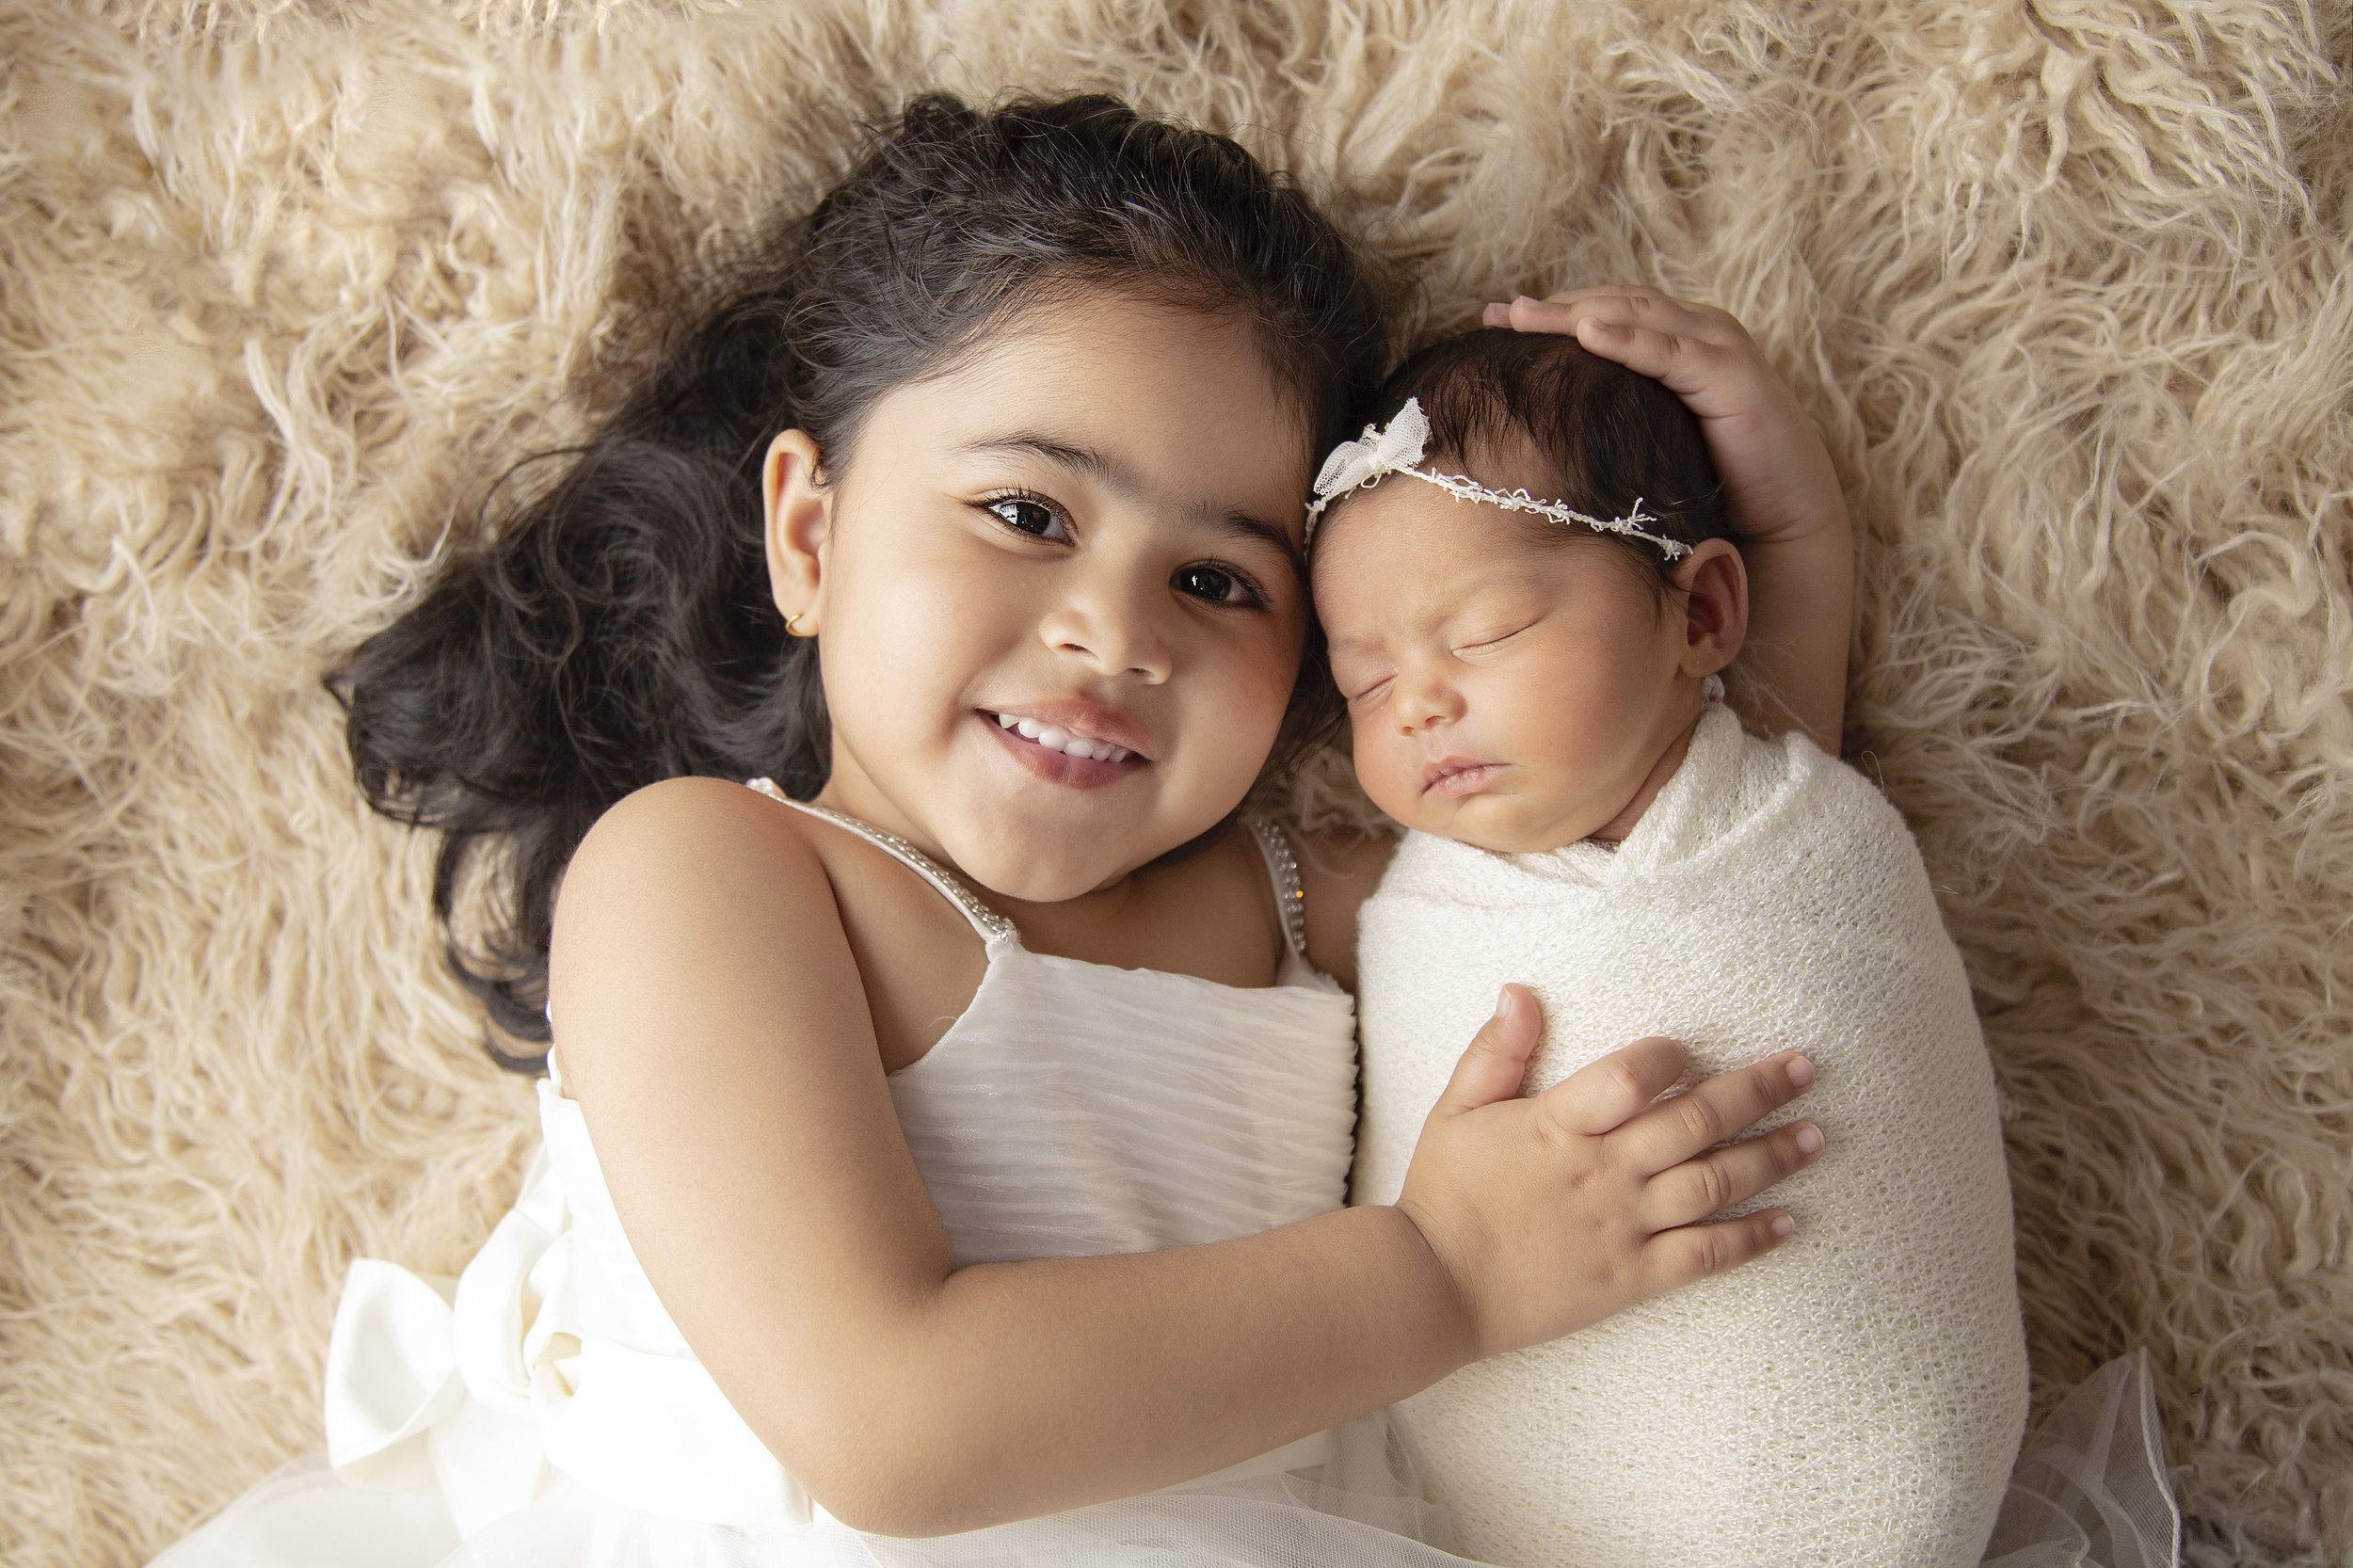 lancaster-newborn-photography-angie-englerth-aep022.jpg